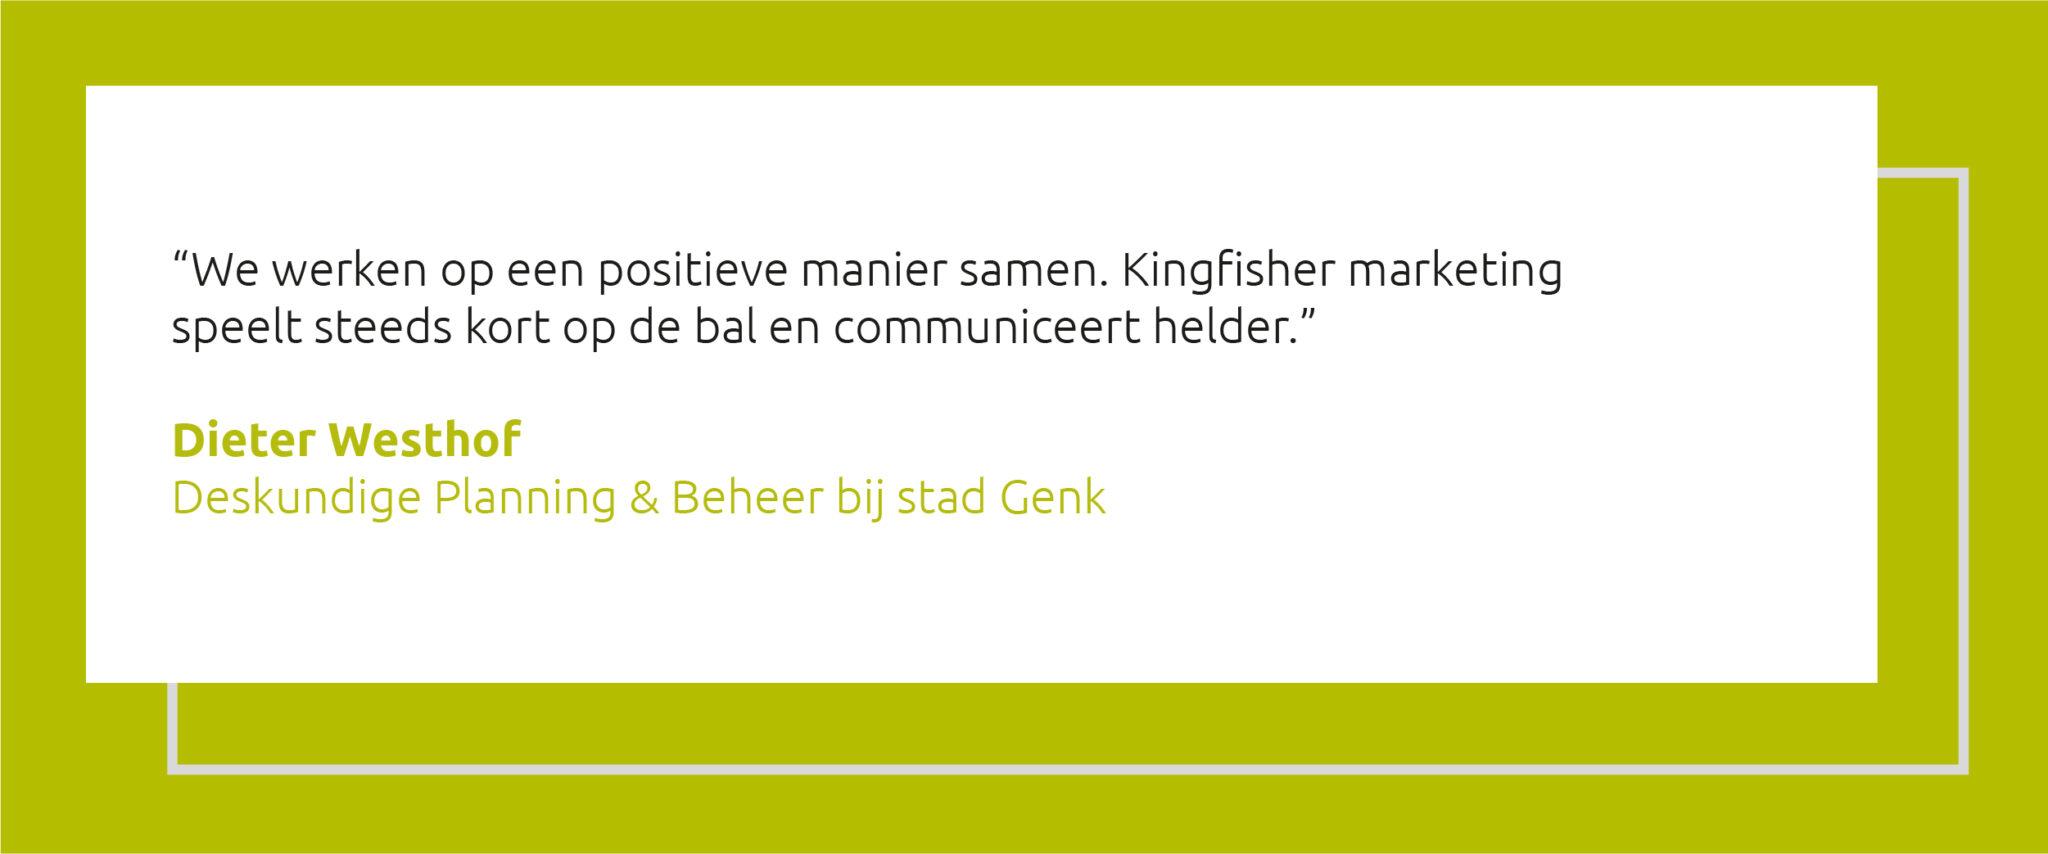 Quote Dieter Westhof stad Genk